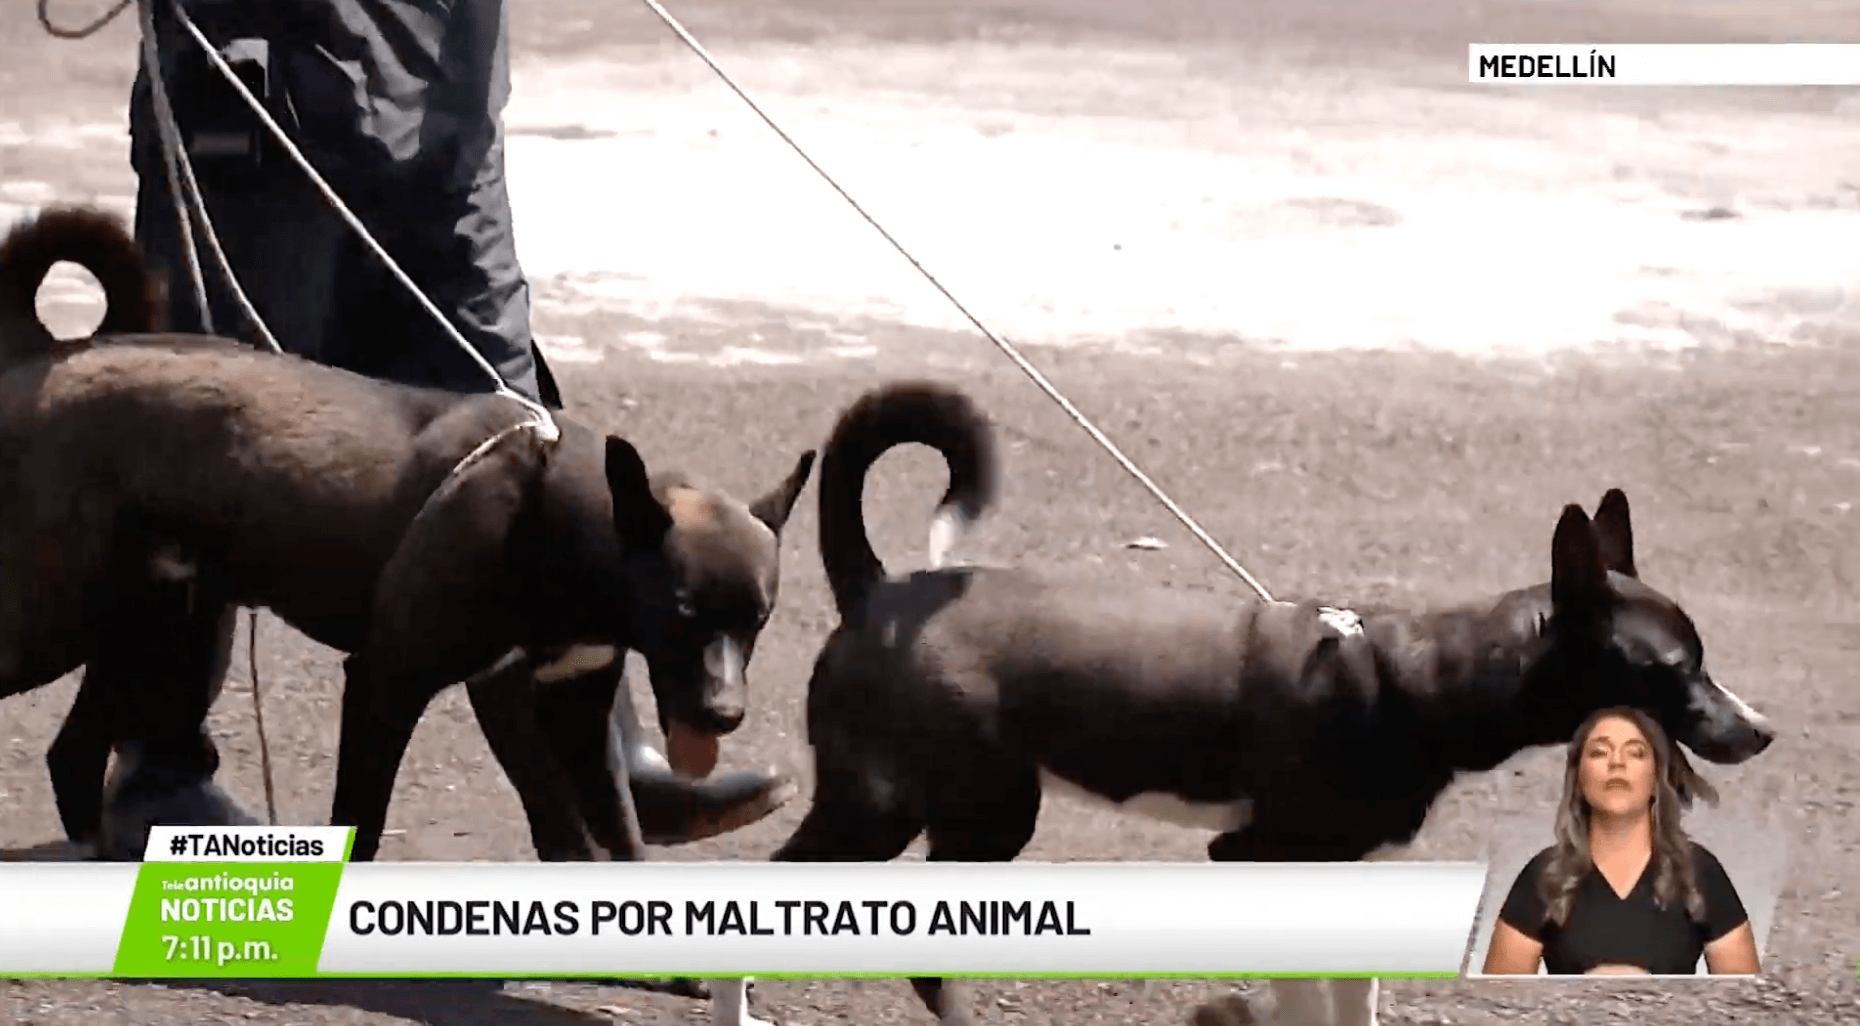 Condenas por maltrato animal